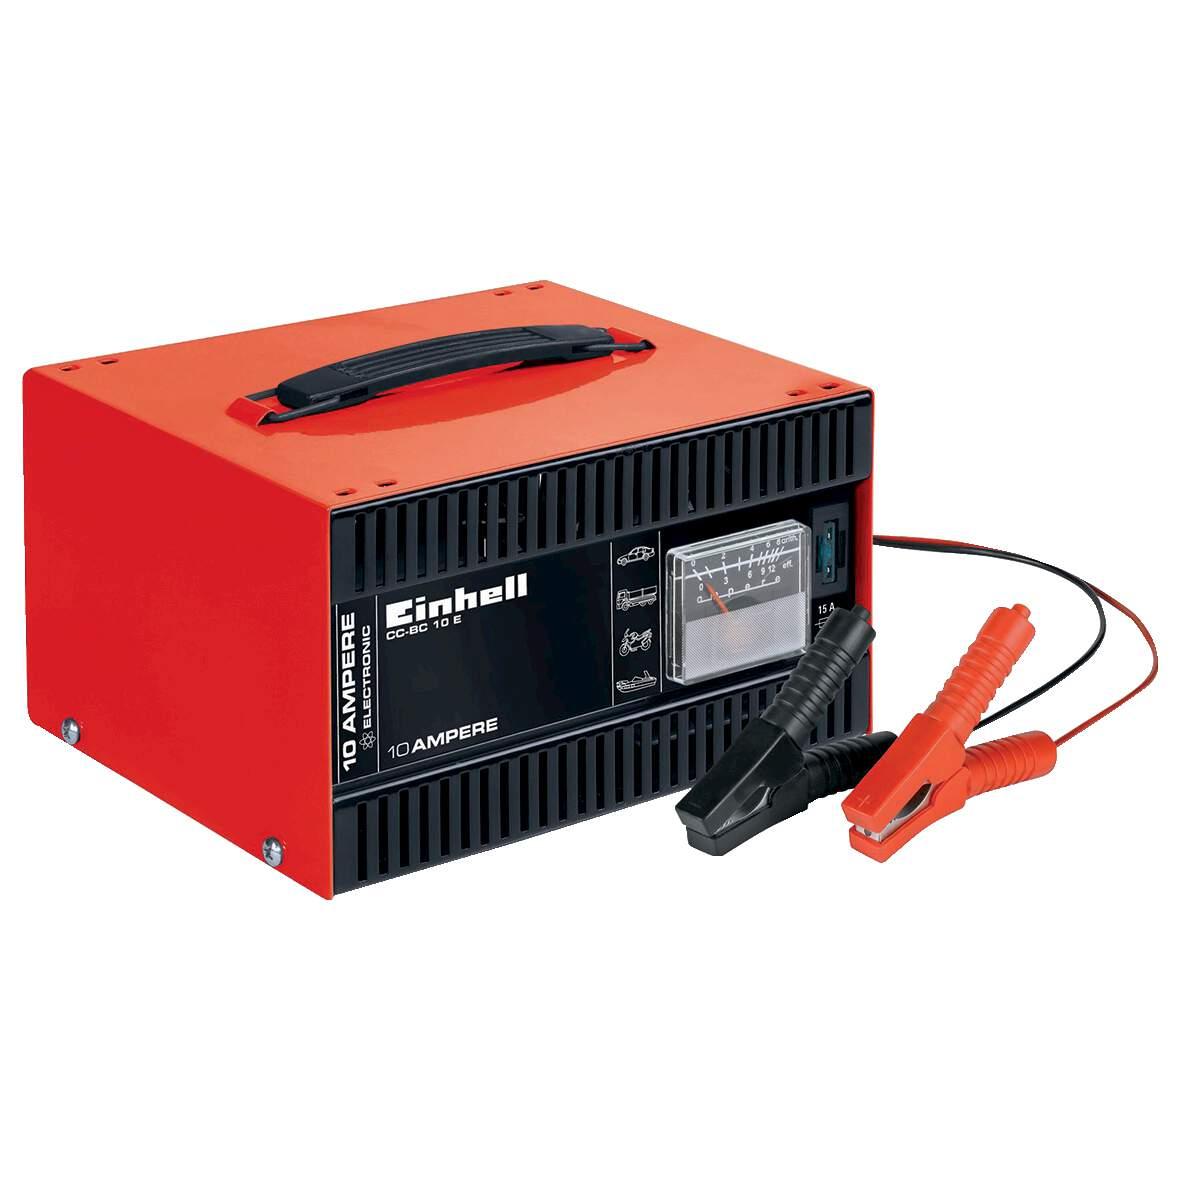 Einhell Batterieladegerät CC BC 10 E (1231183) LET'S DOIT